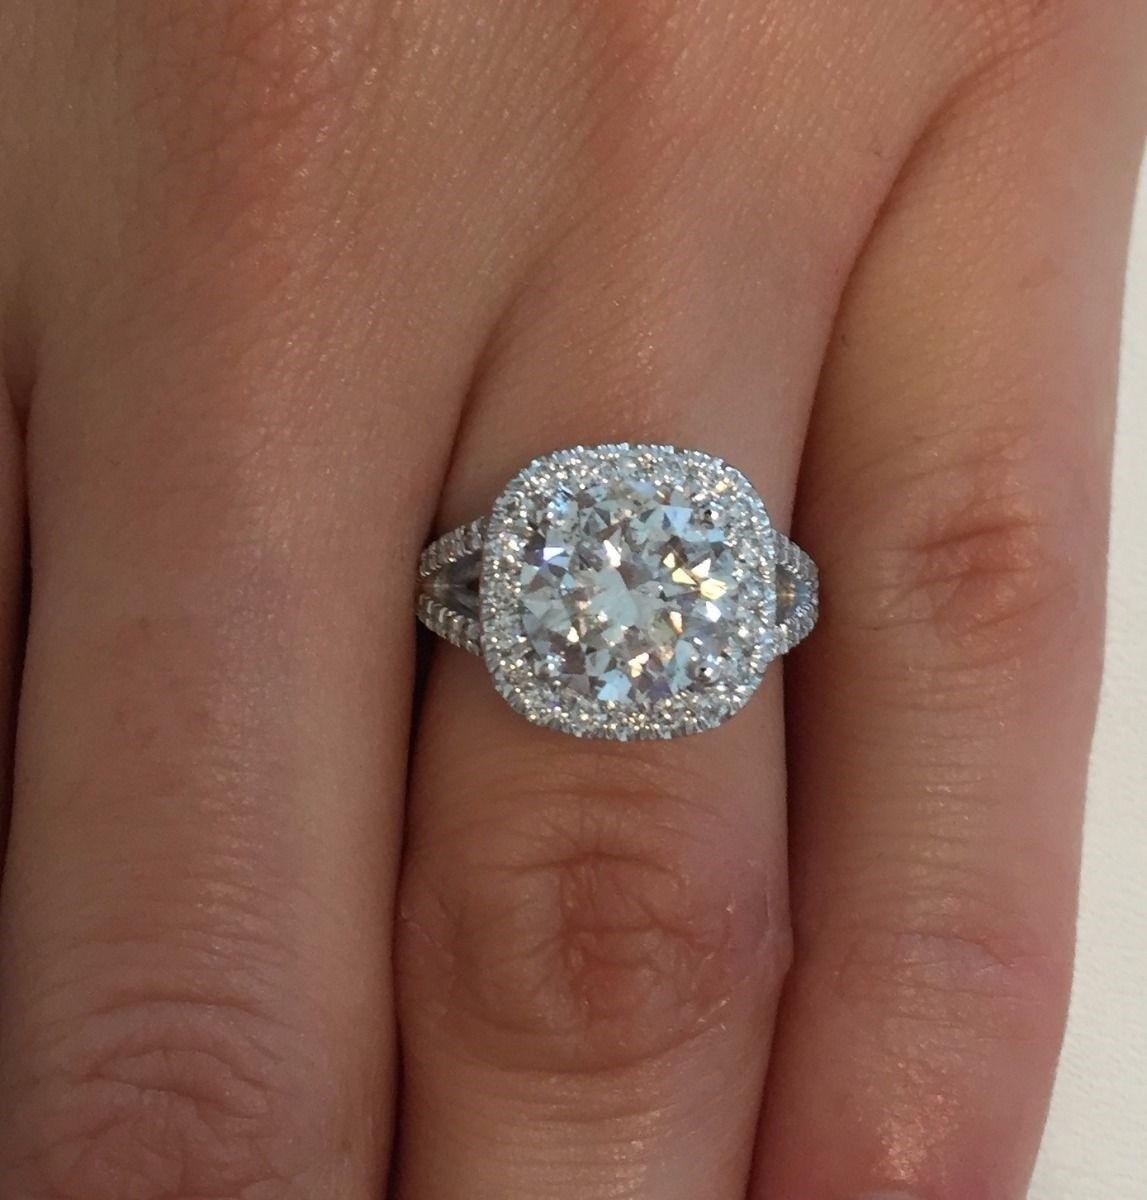 Vs 4 1 2 Ct Natural Cushion Halo Round Diamond Engagement Ring 14k White Gold Ebay Halo Diamond Engagement Ring Diamond Engagement Rings Engagement Rings